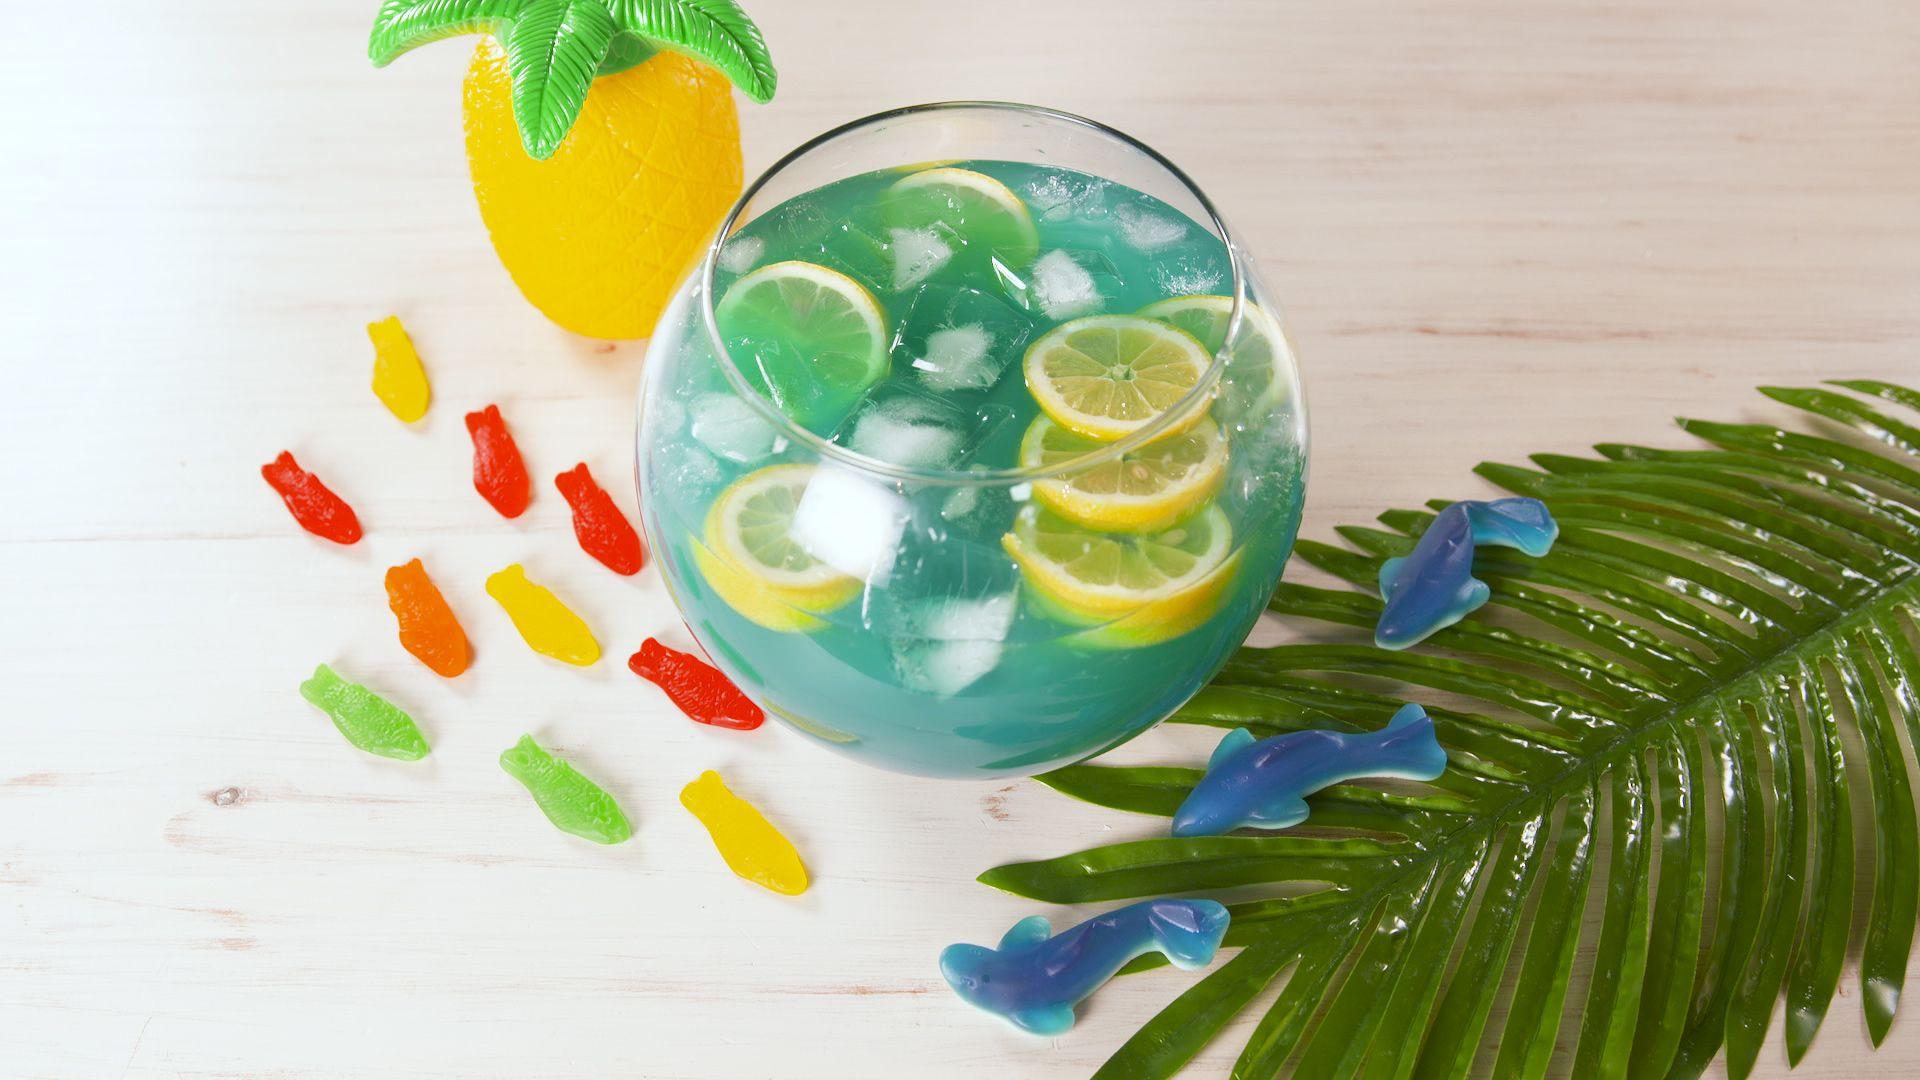 Best Boozy Fishbowl Recipe - How To Make Boozy Fishbowl